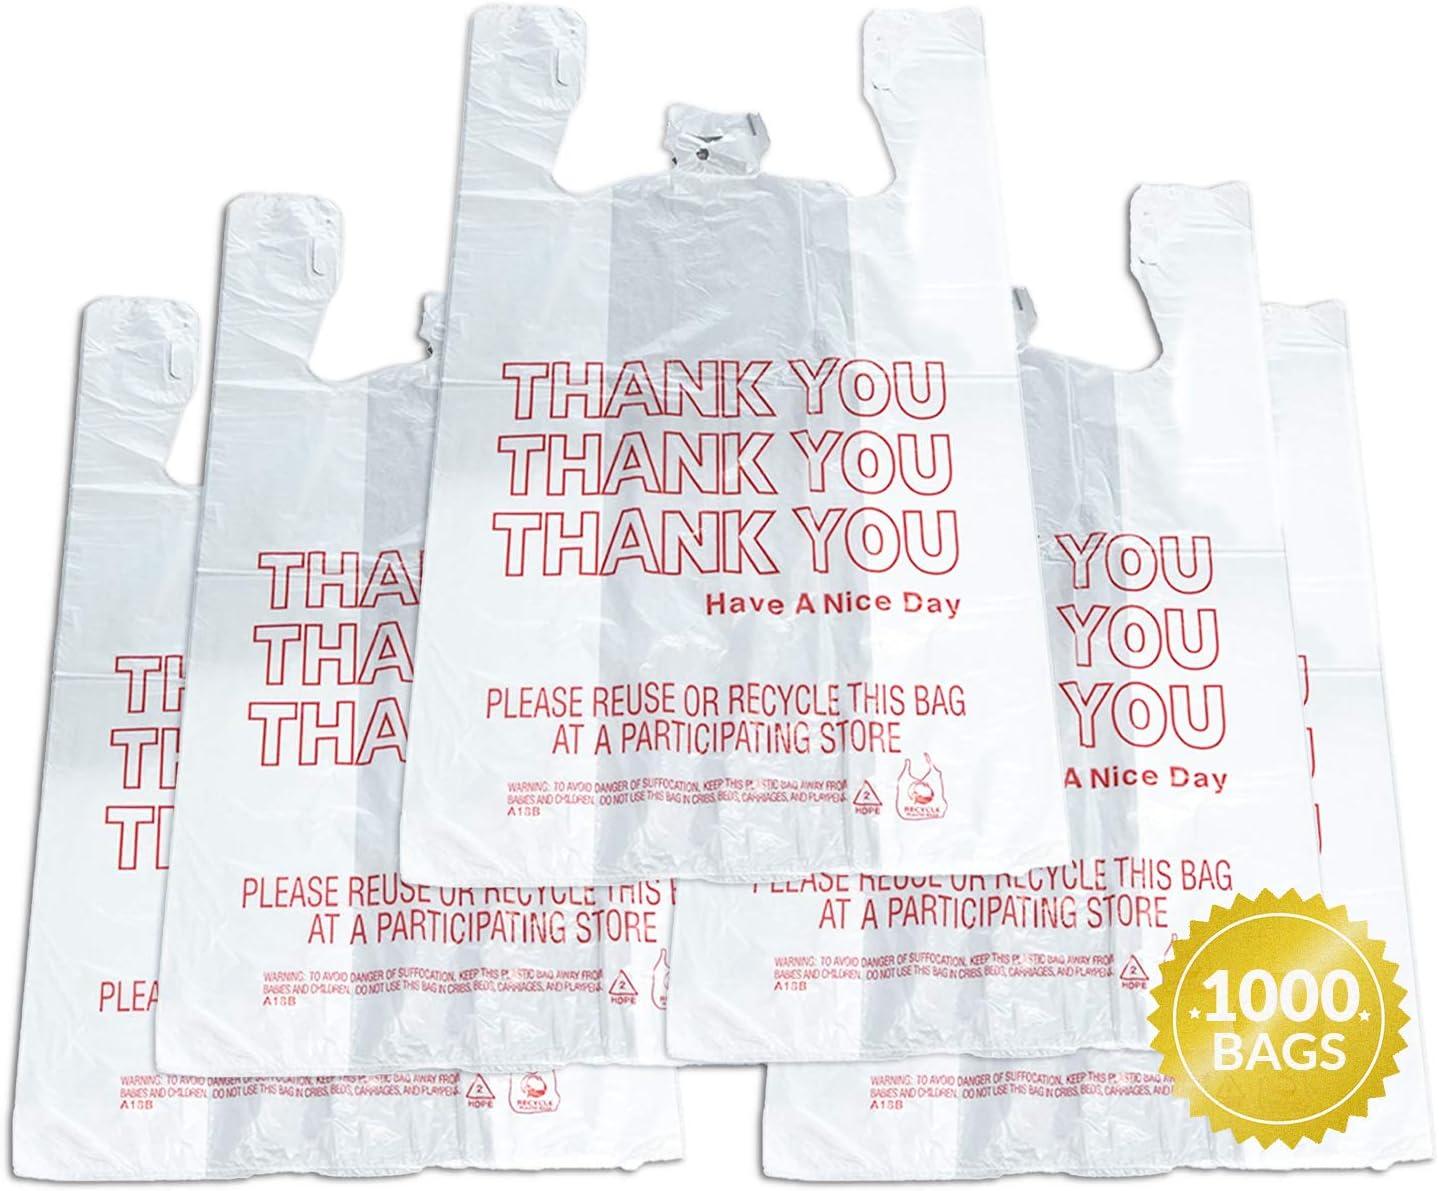 Reli. Thank You T-Shirt Bags (1000 Count), Plastic - Bulk Shopping Bags, Restaurant Bag - T-Shirt Plastic Bags in Bulk - (11.5